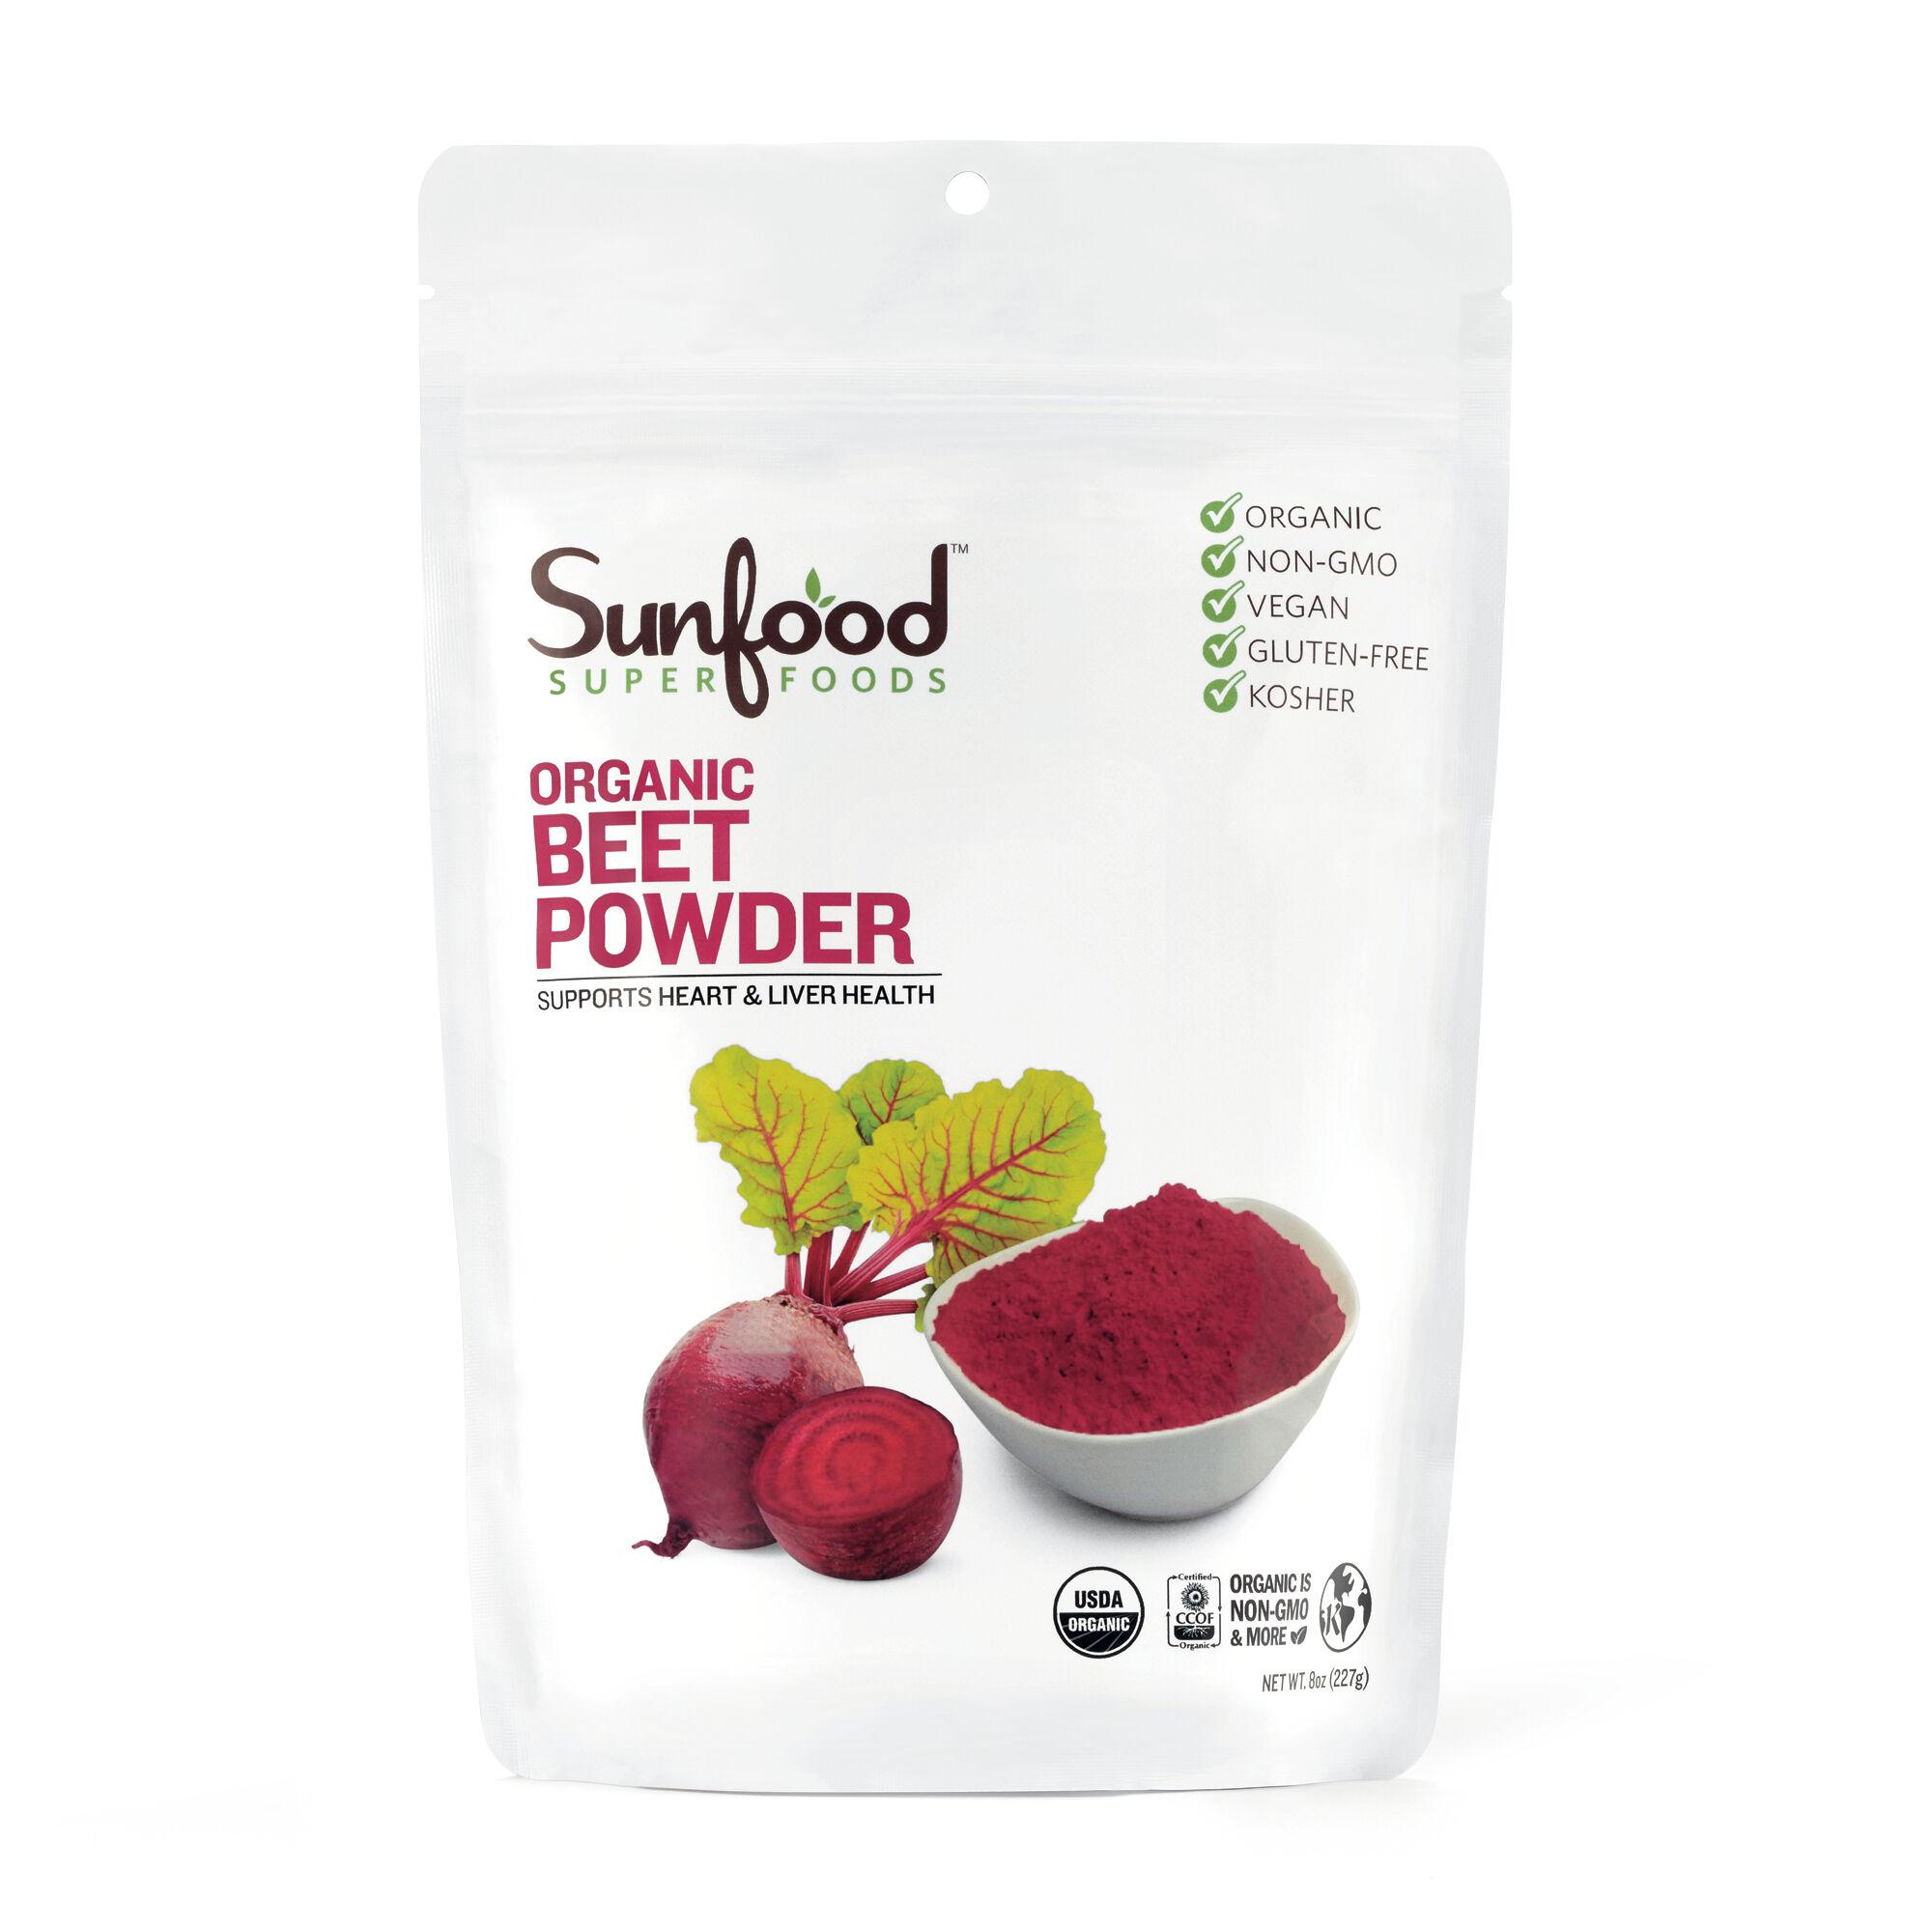 Sunfood™ Super Foods Organic Beet Powder